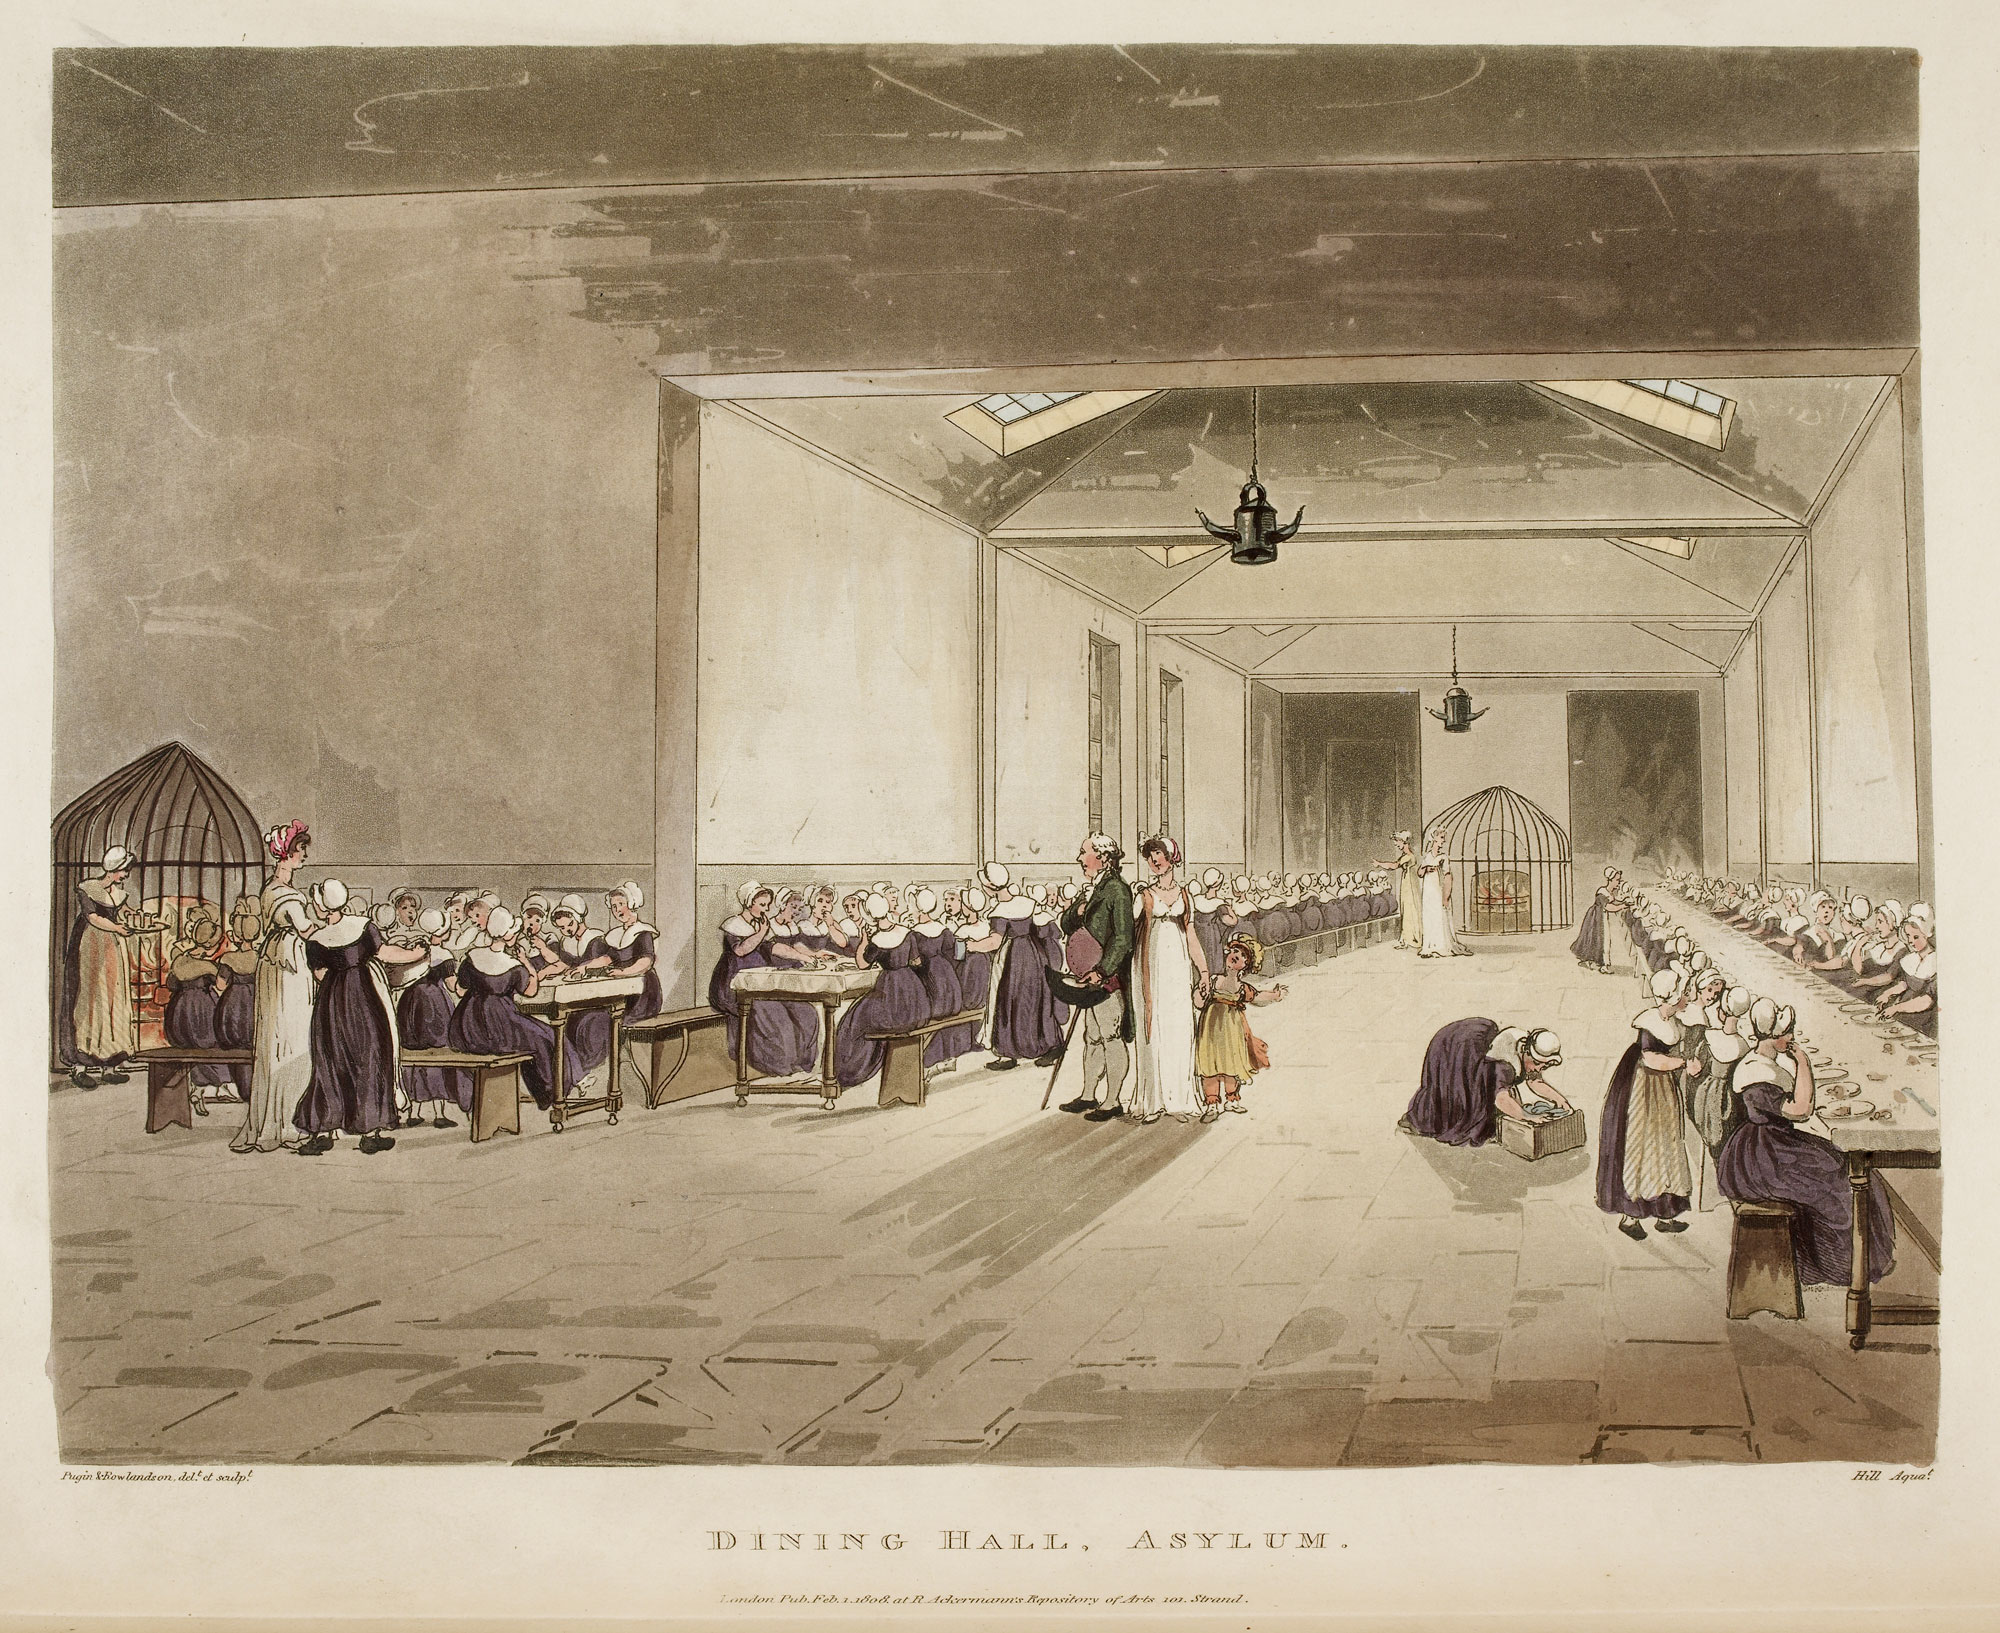 Illustration of the Dining Hall, Asylum